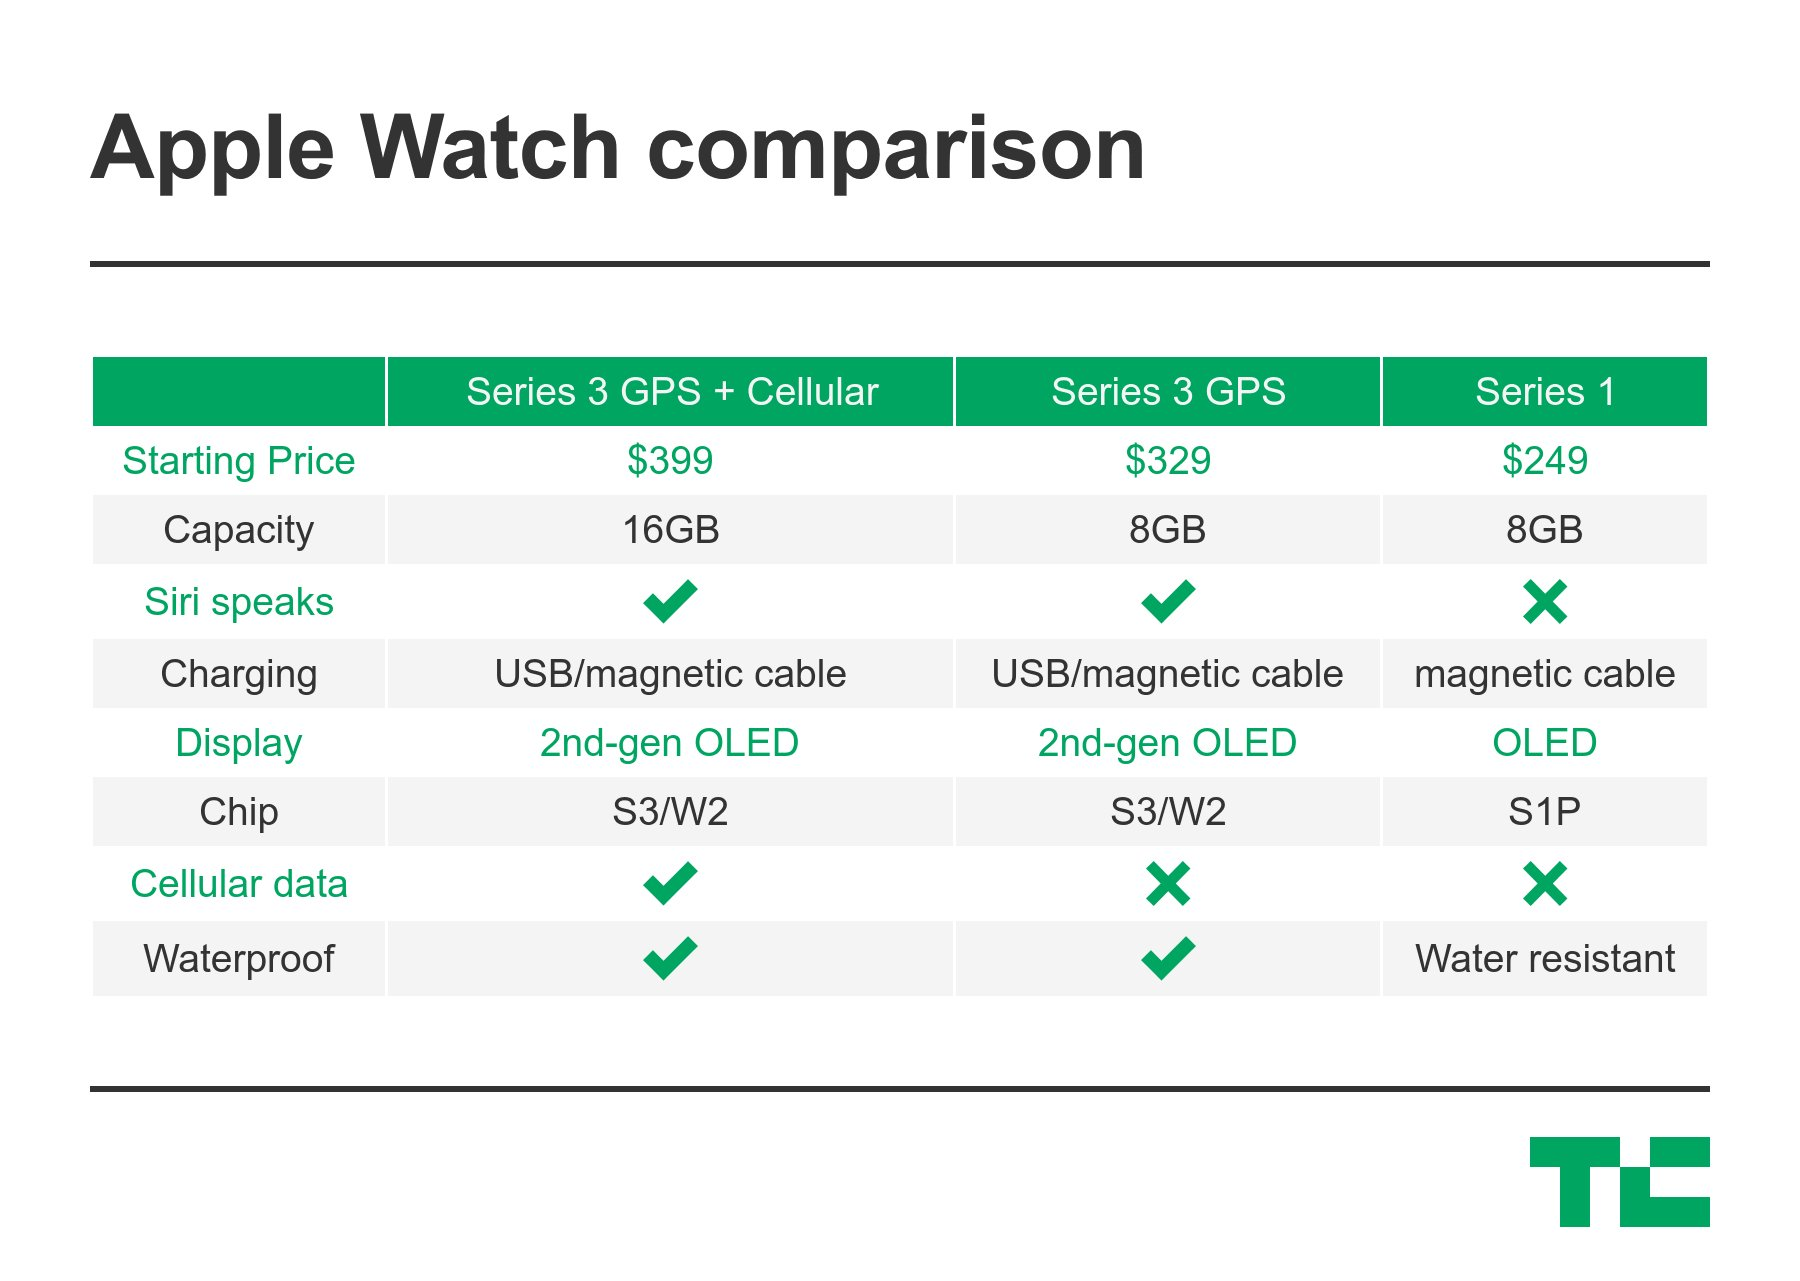 New Apple Watch available in ceramic gray; orders begin September 15 https://t.co/1FDsPTxZbI #AppleEvent https://t.co/yclGv0JVv7